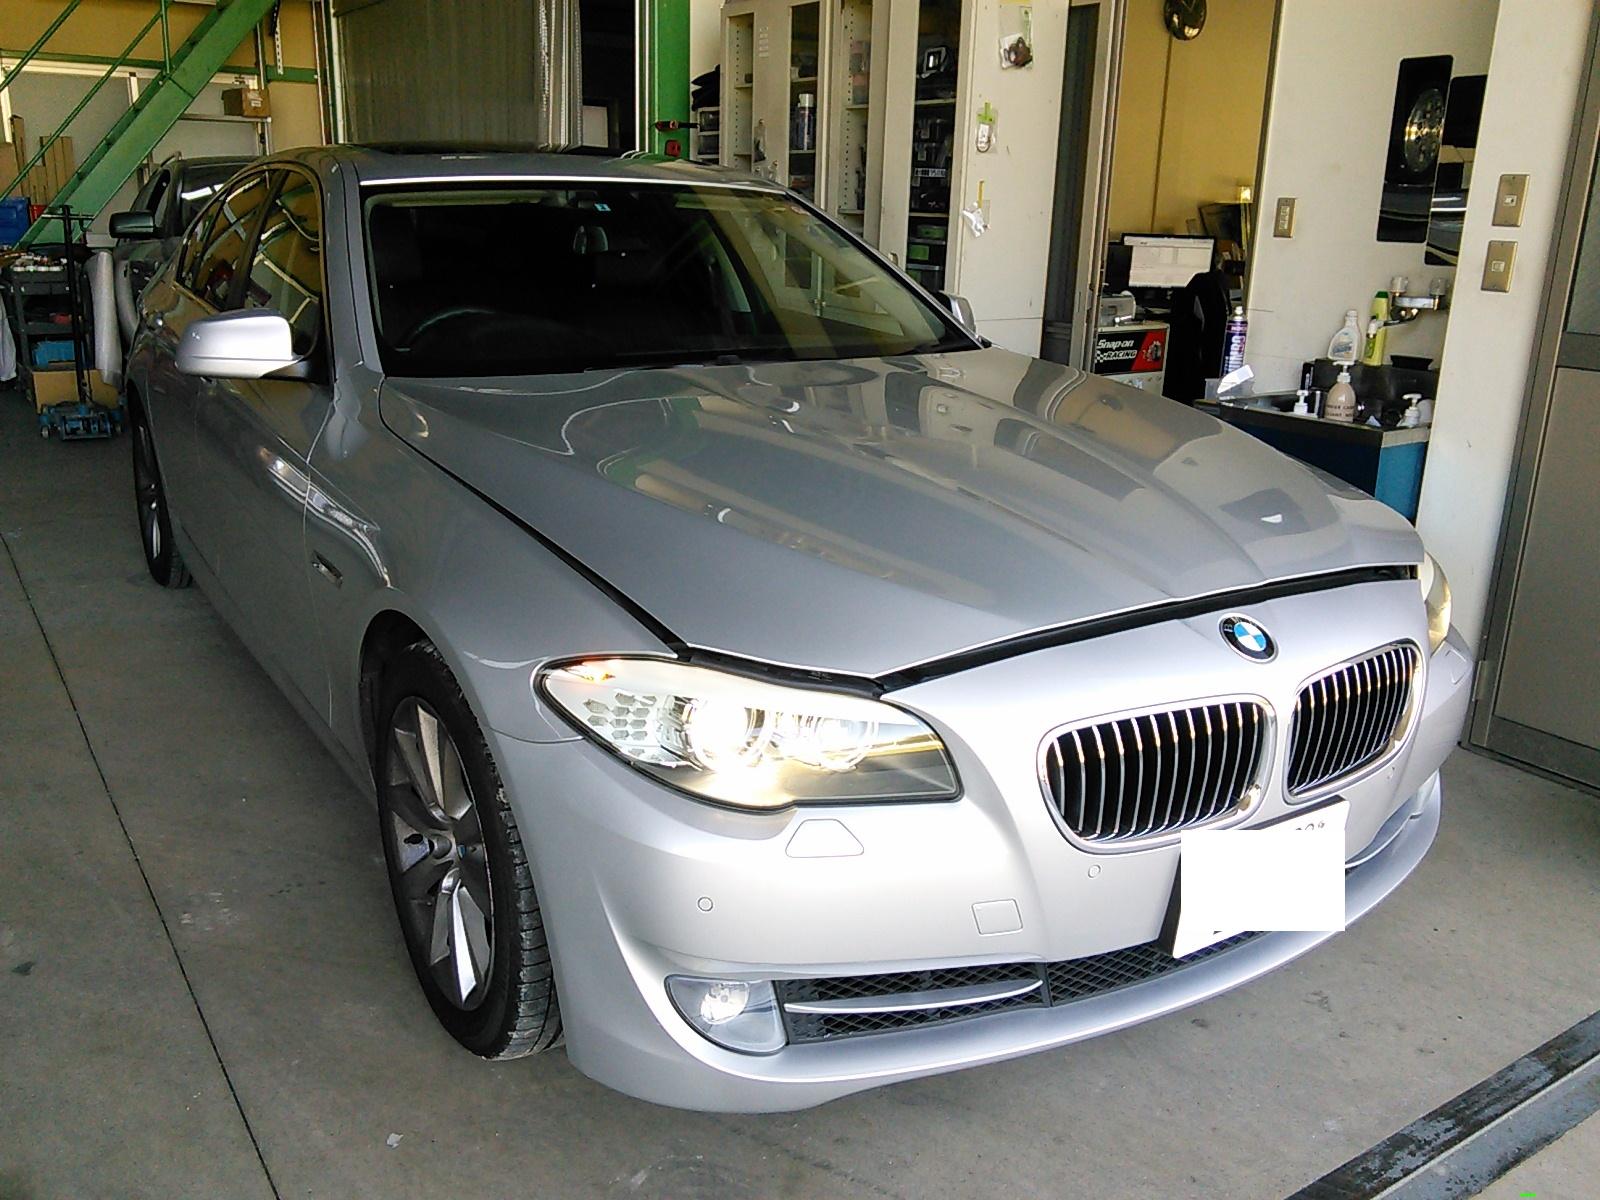 BMW535 F10 低ダストブレーキパッド(breni.com )交換 1ヶ月後のダスト量激減